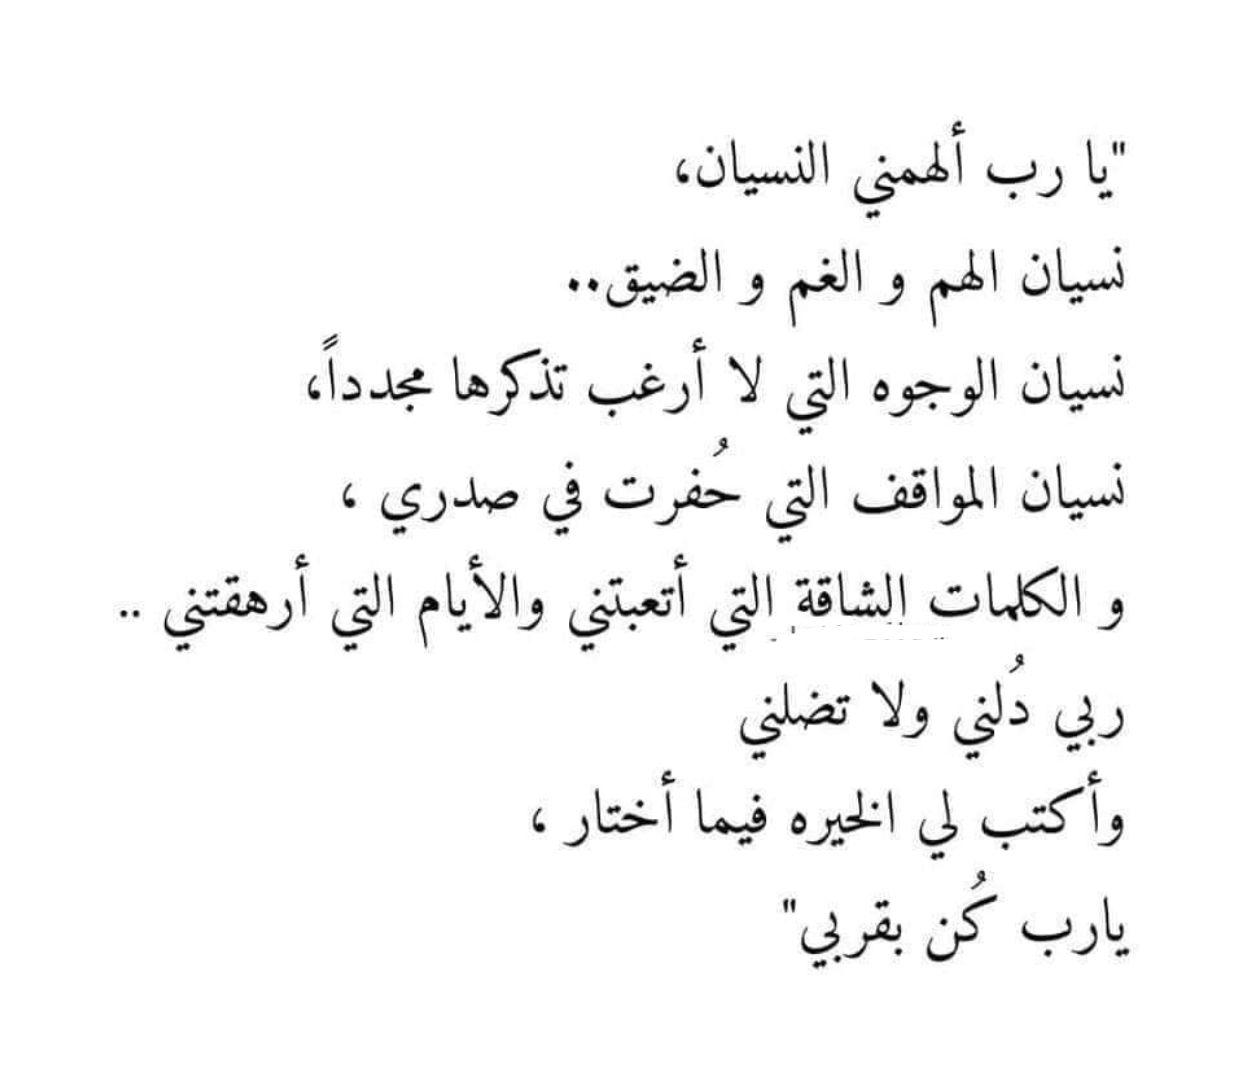 Pin By Sara Saro On الو جع Quran Arabic Quotes Words